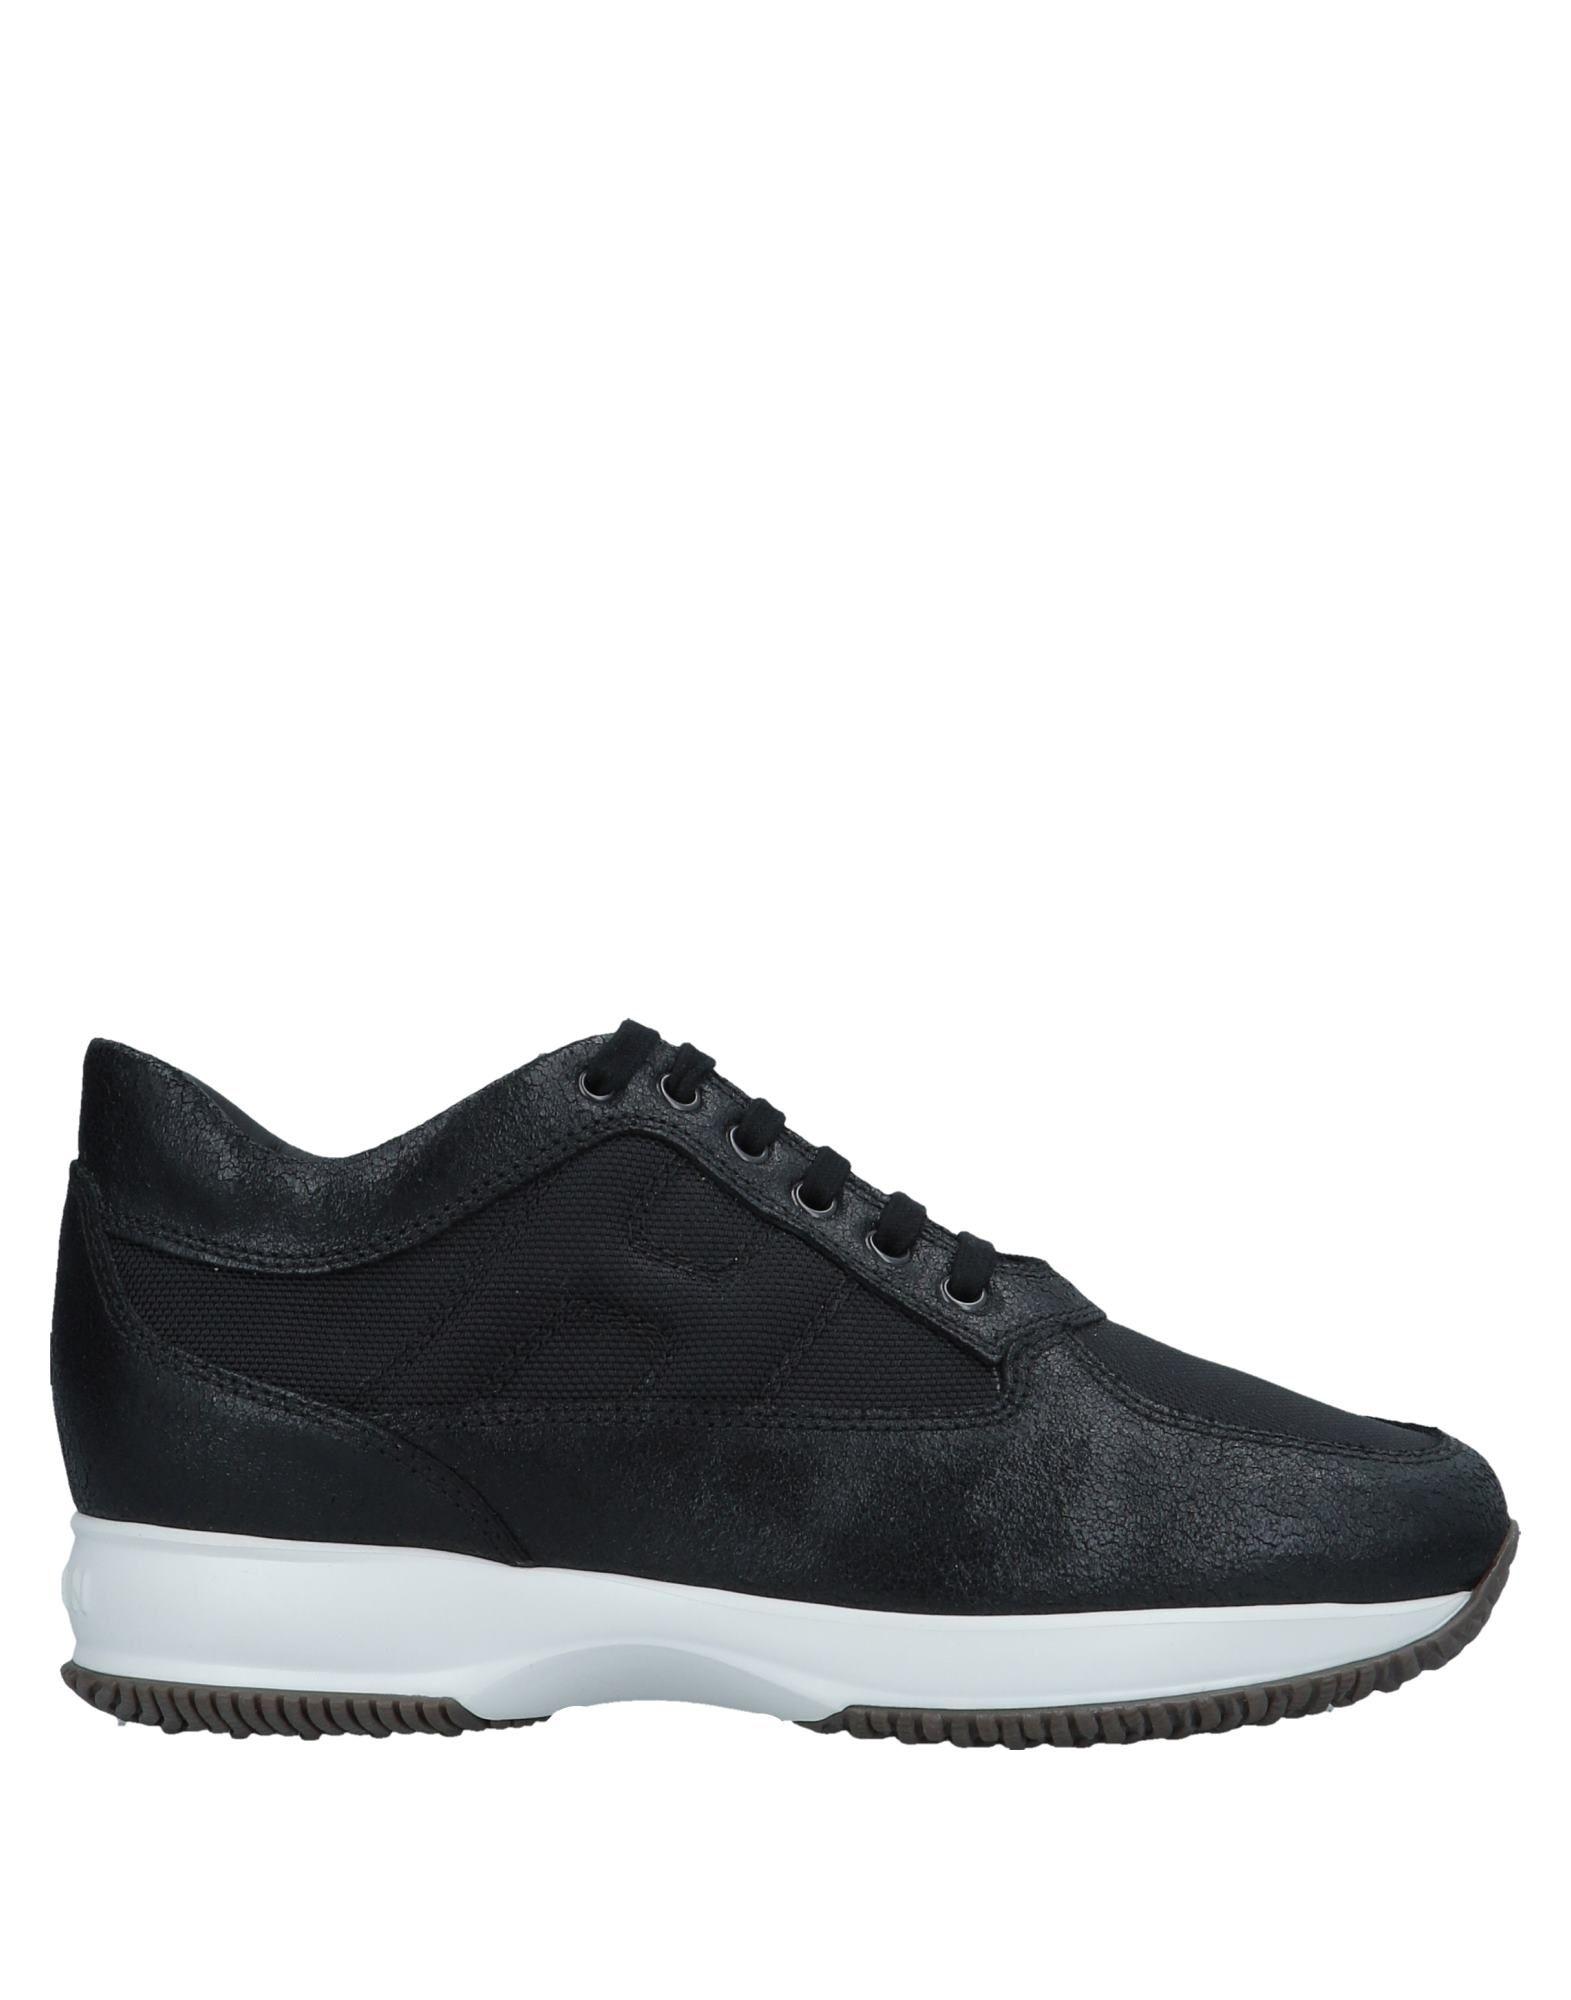 Hogan Sneakers Herren  11560738EK Gute Qualität beliebte Schuhe